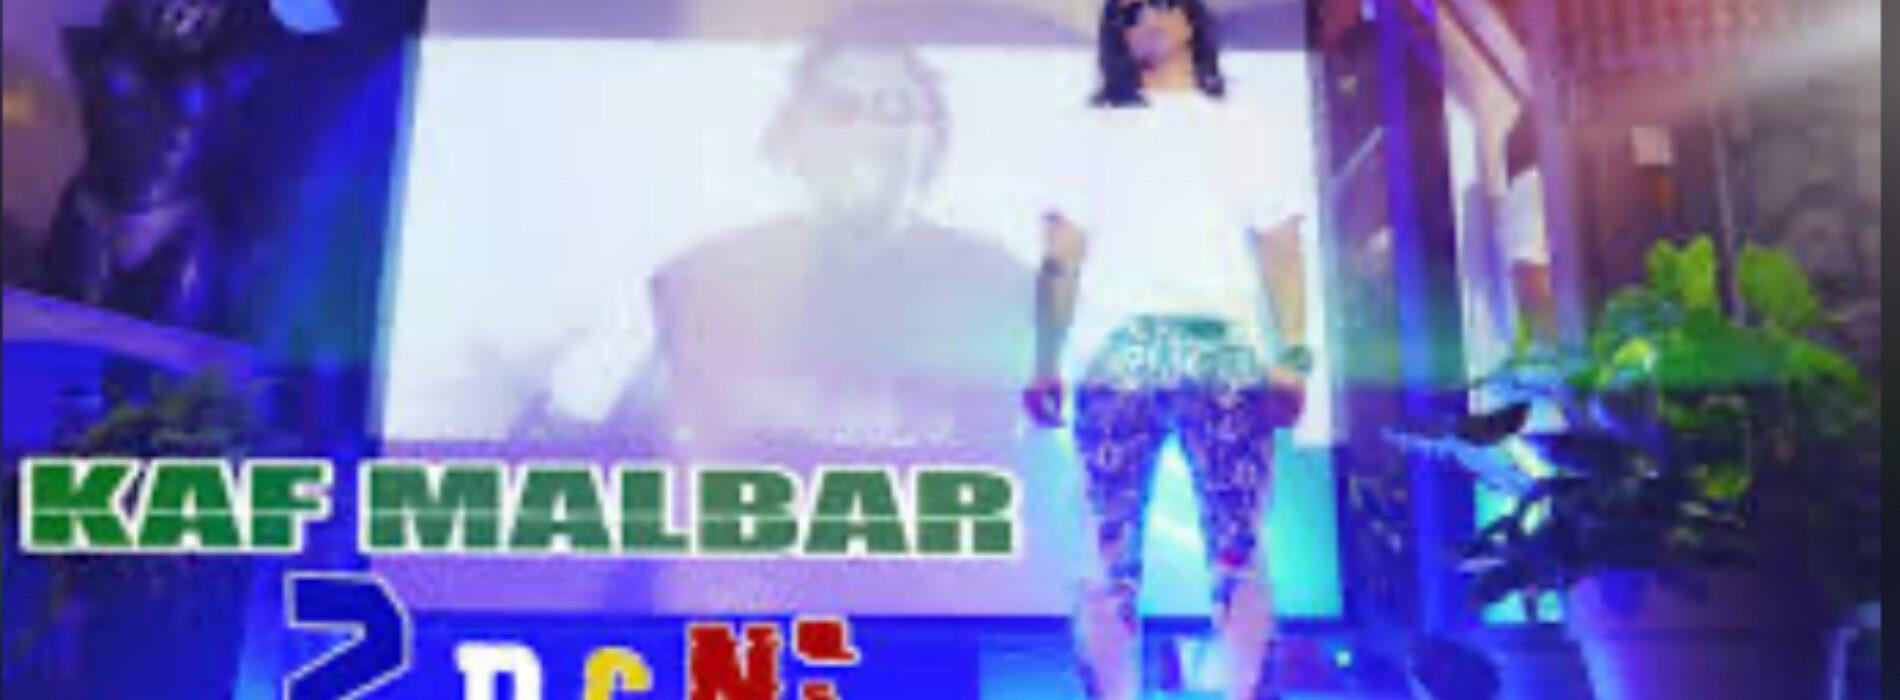 Kaf Malbar feat Rikos – 2 D C N I – Avril 2021